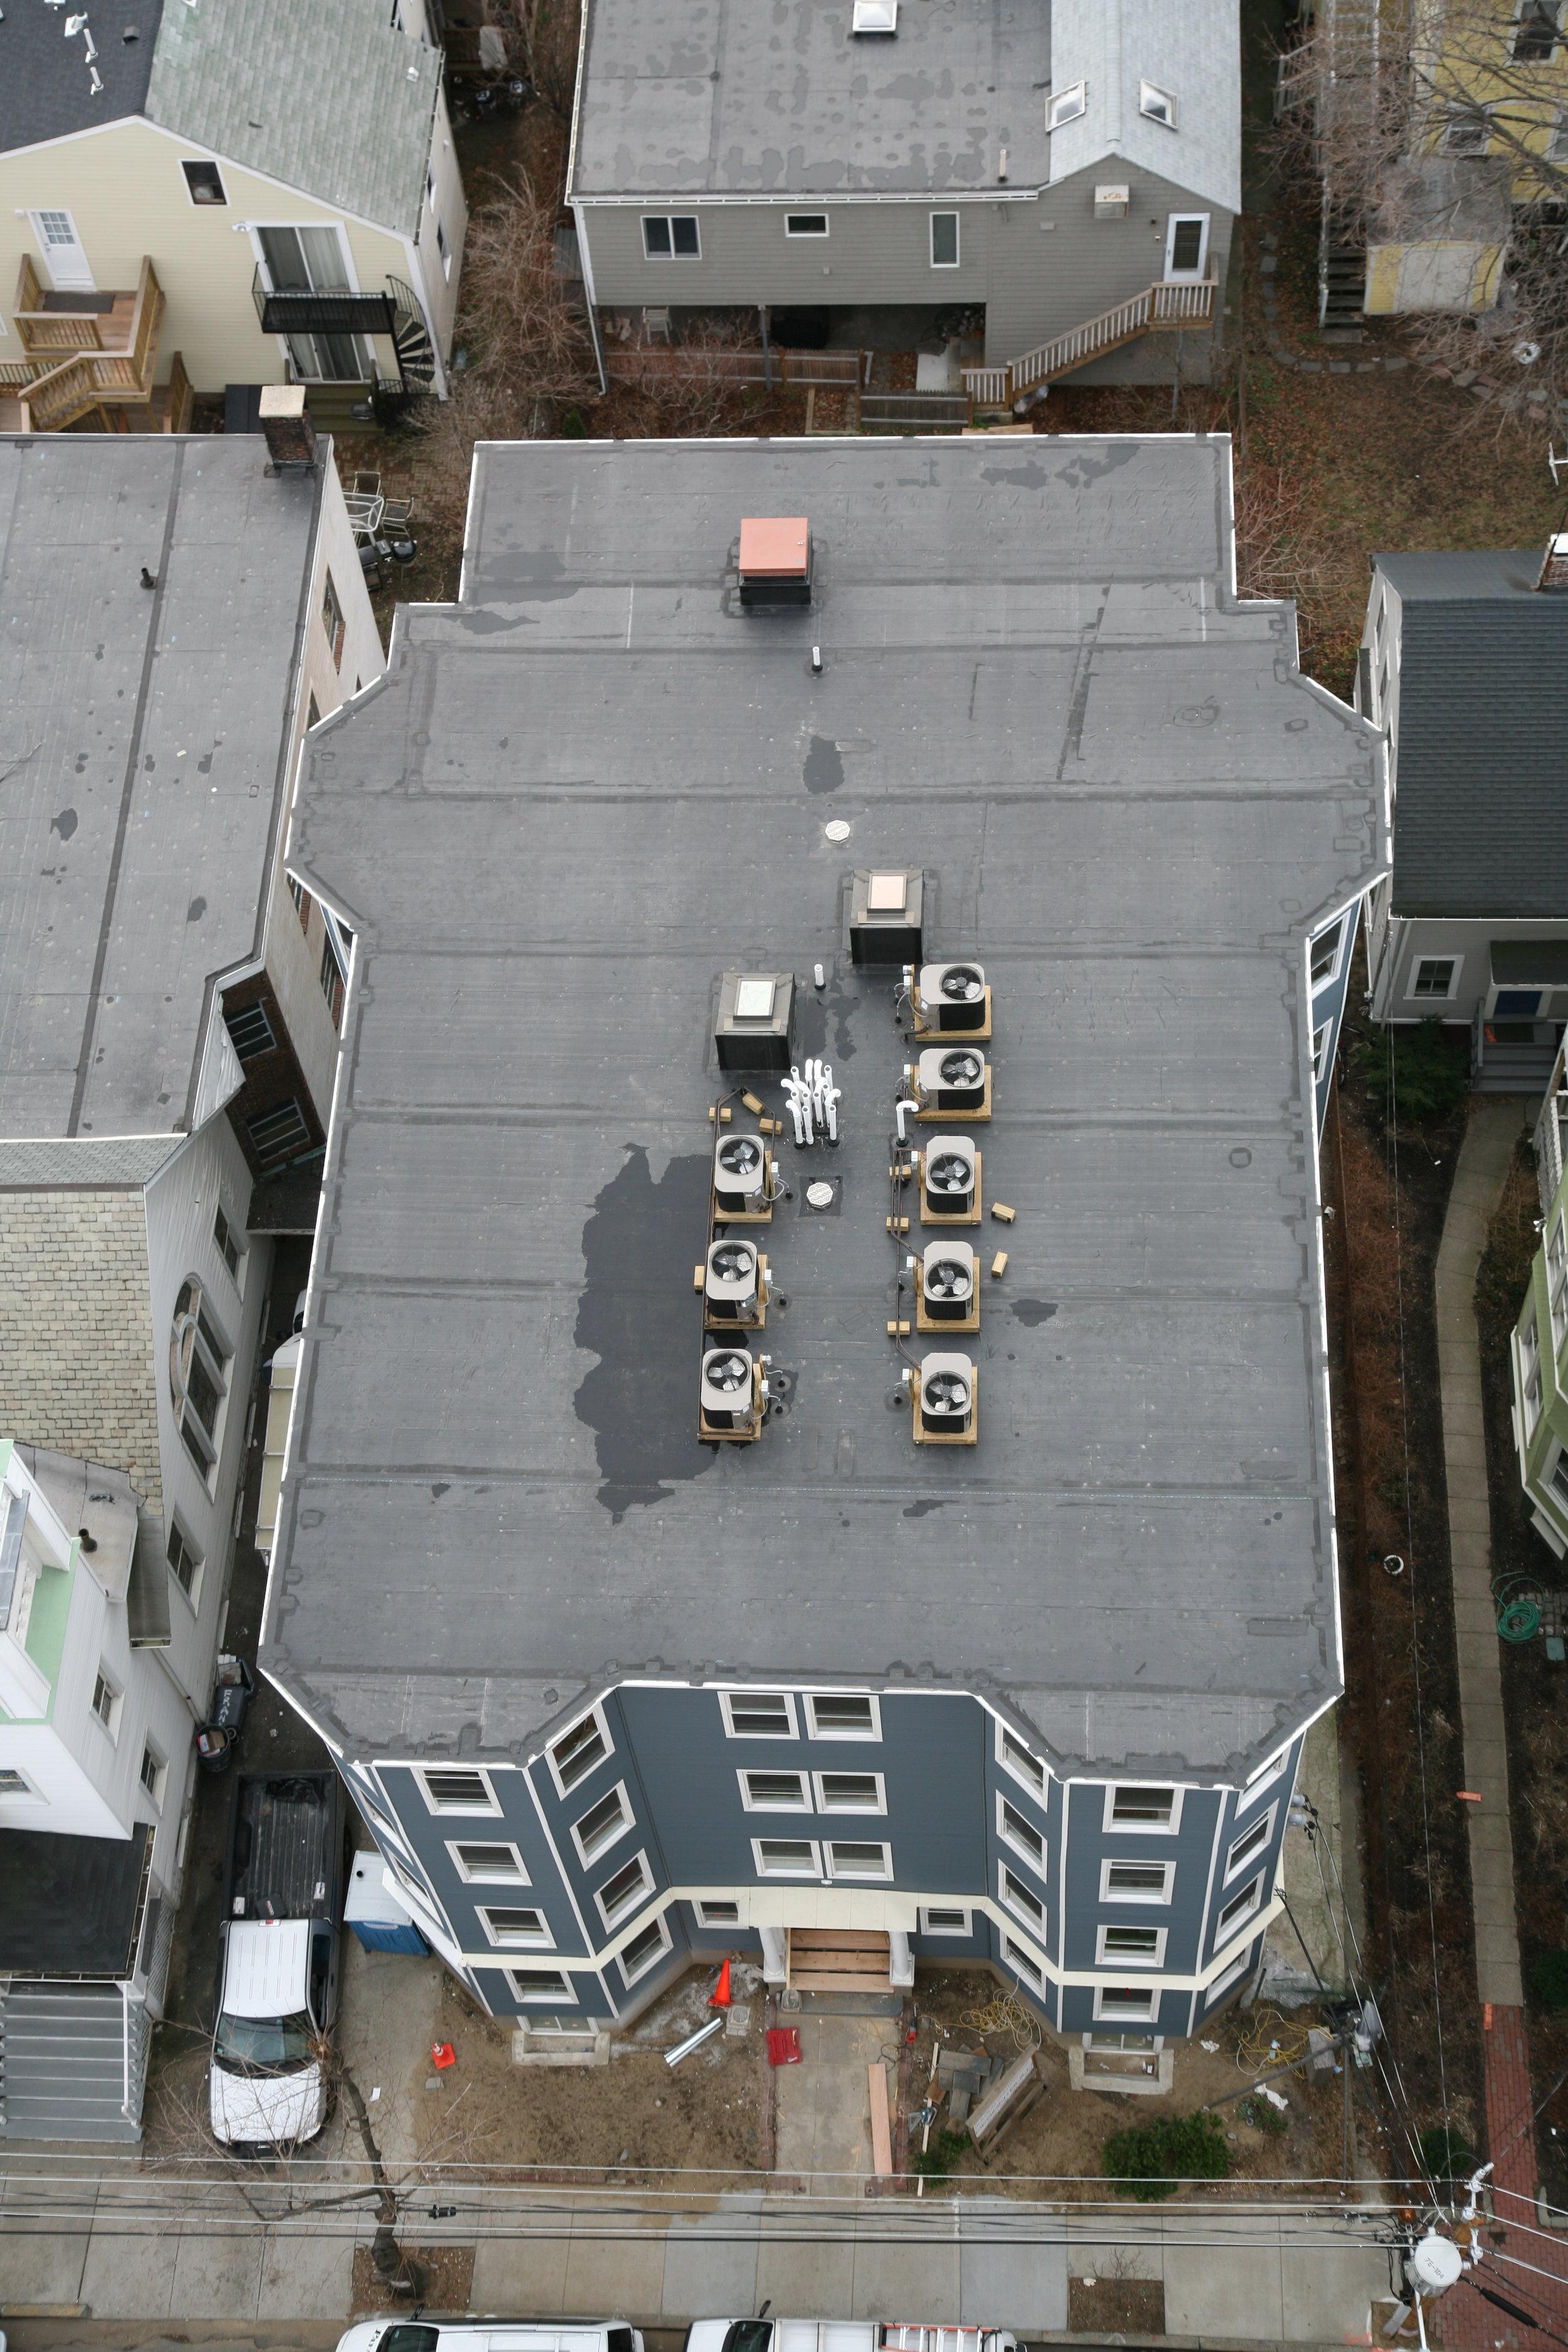 Cambridge Condo Fire Damage Reconstruction   Professional Loss Adjusters